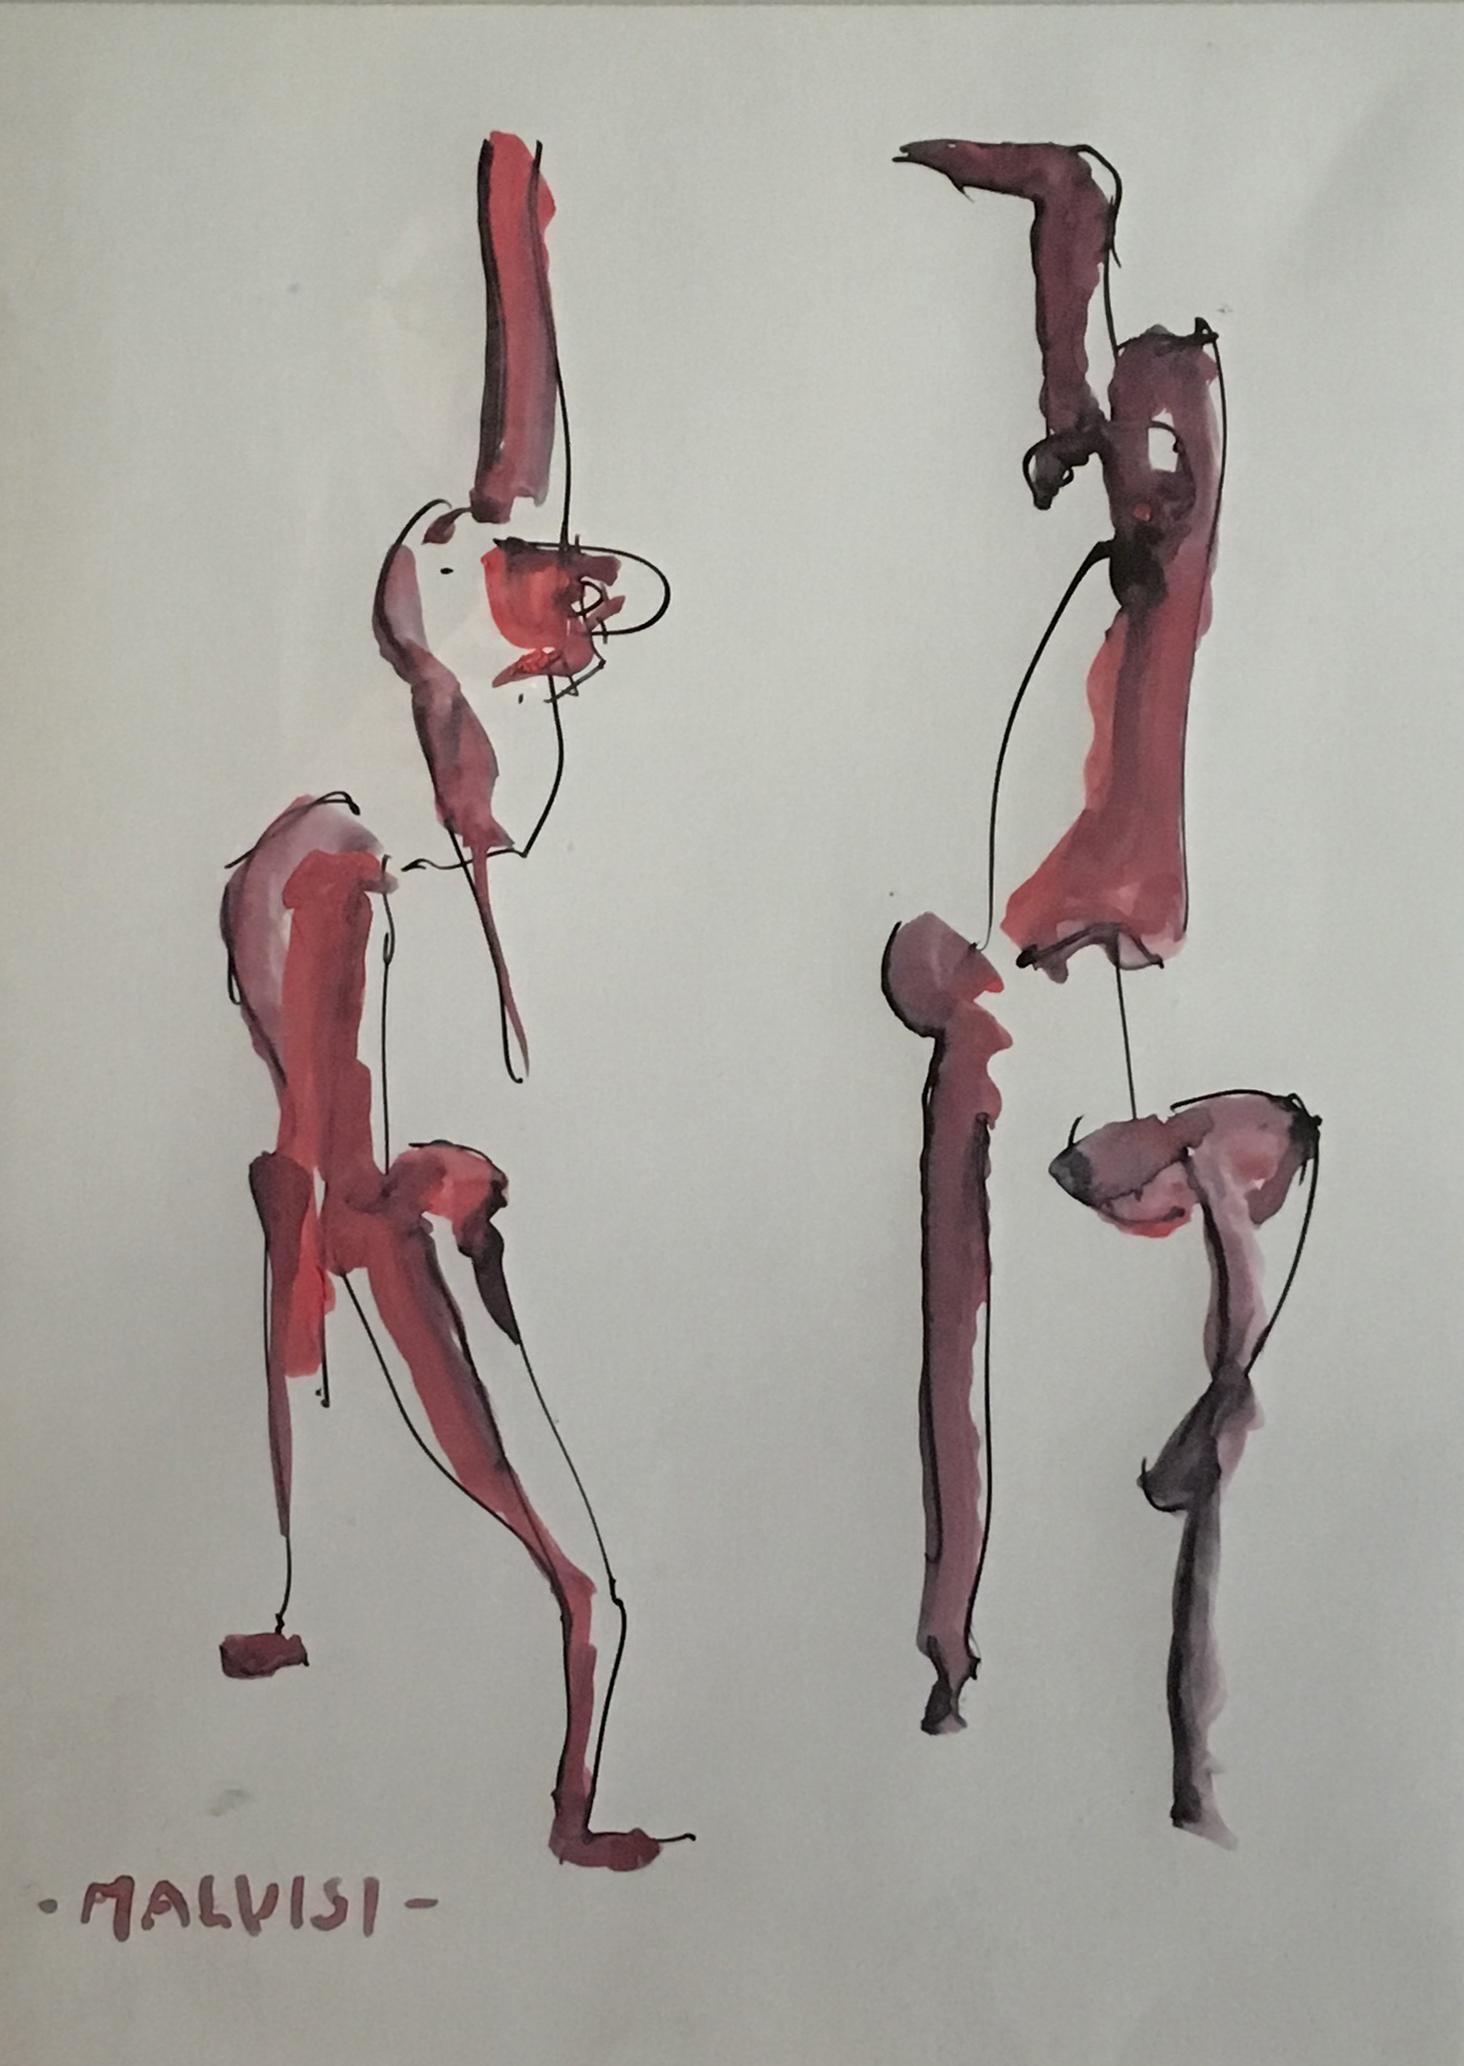 <b>The totality of the sign</b><br> (Orig.La totlita' del Segno) <br>2013 Watercolor ink <br> cm 35 x 50